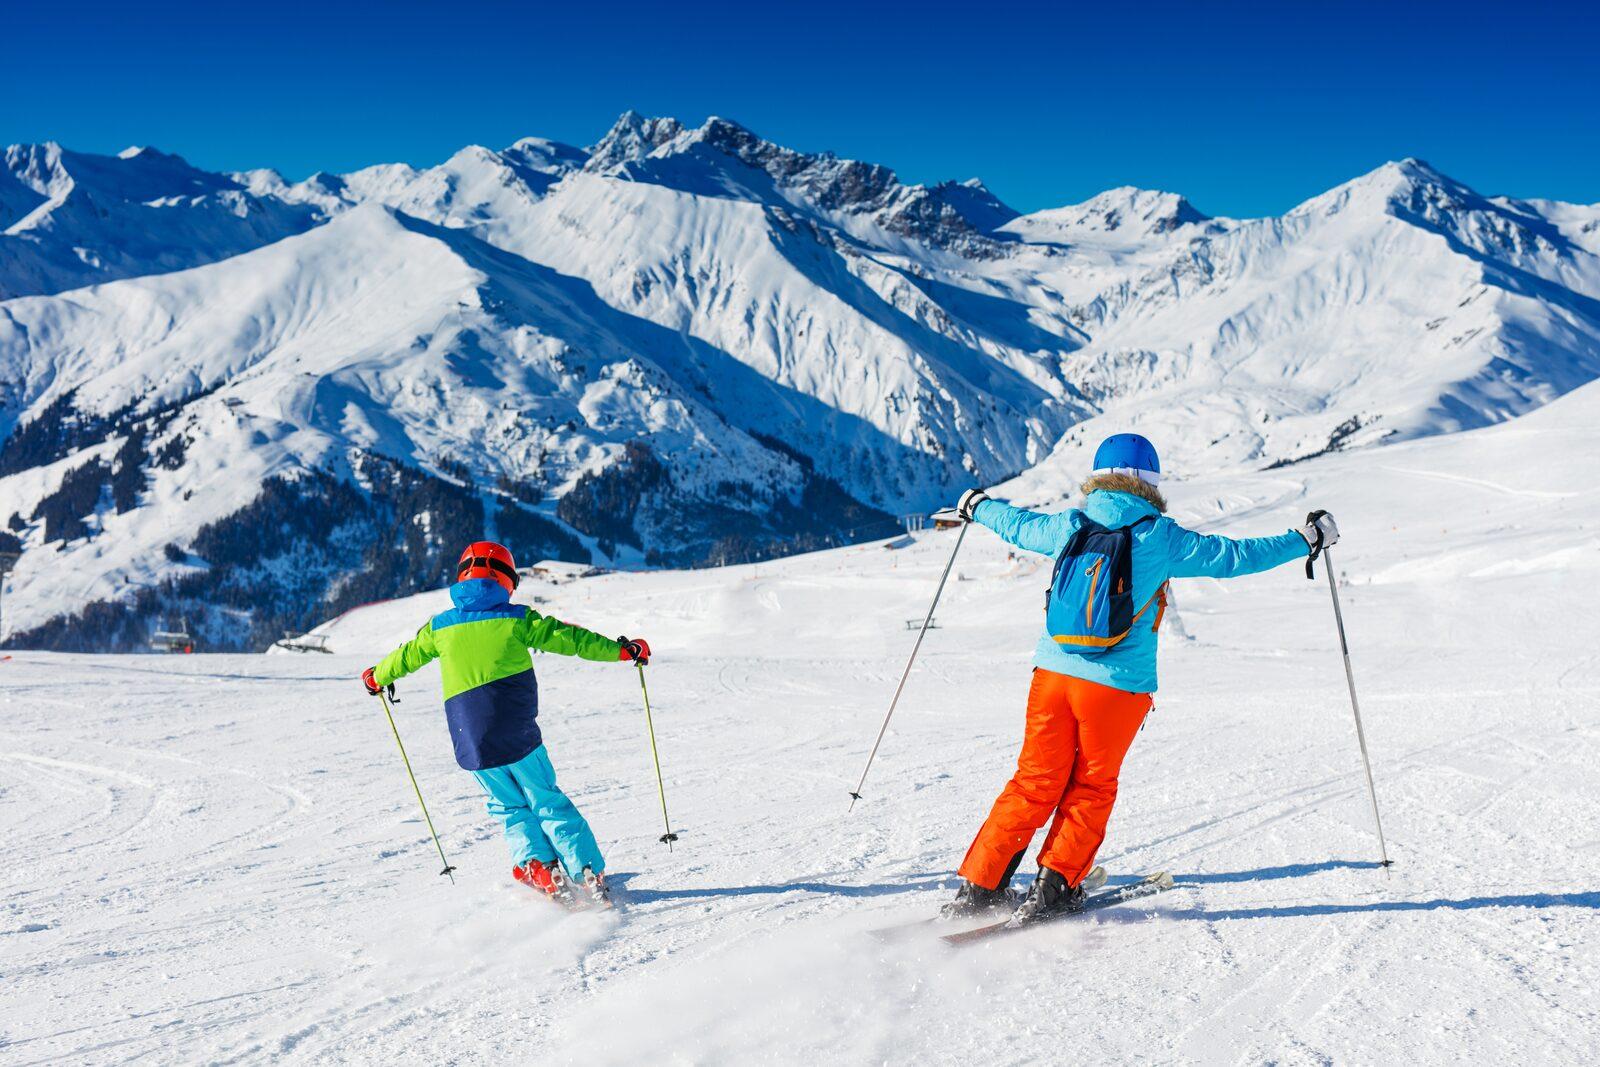 Wintersport Urlaub 2021-2022 in Les Portes du Soleil